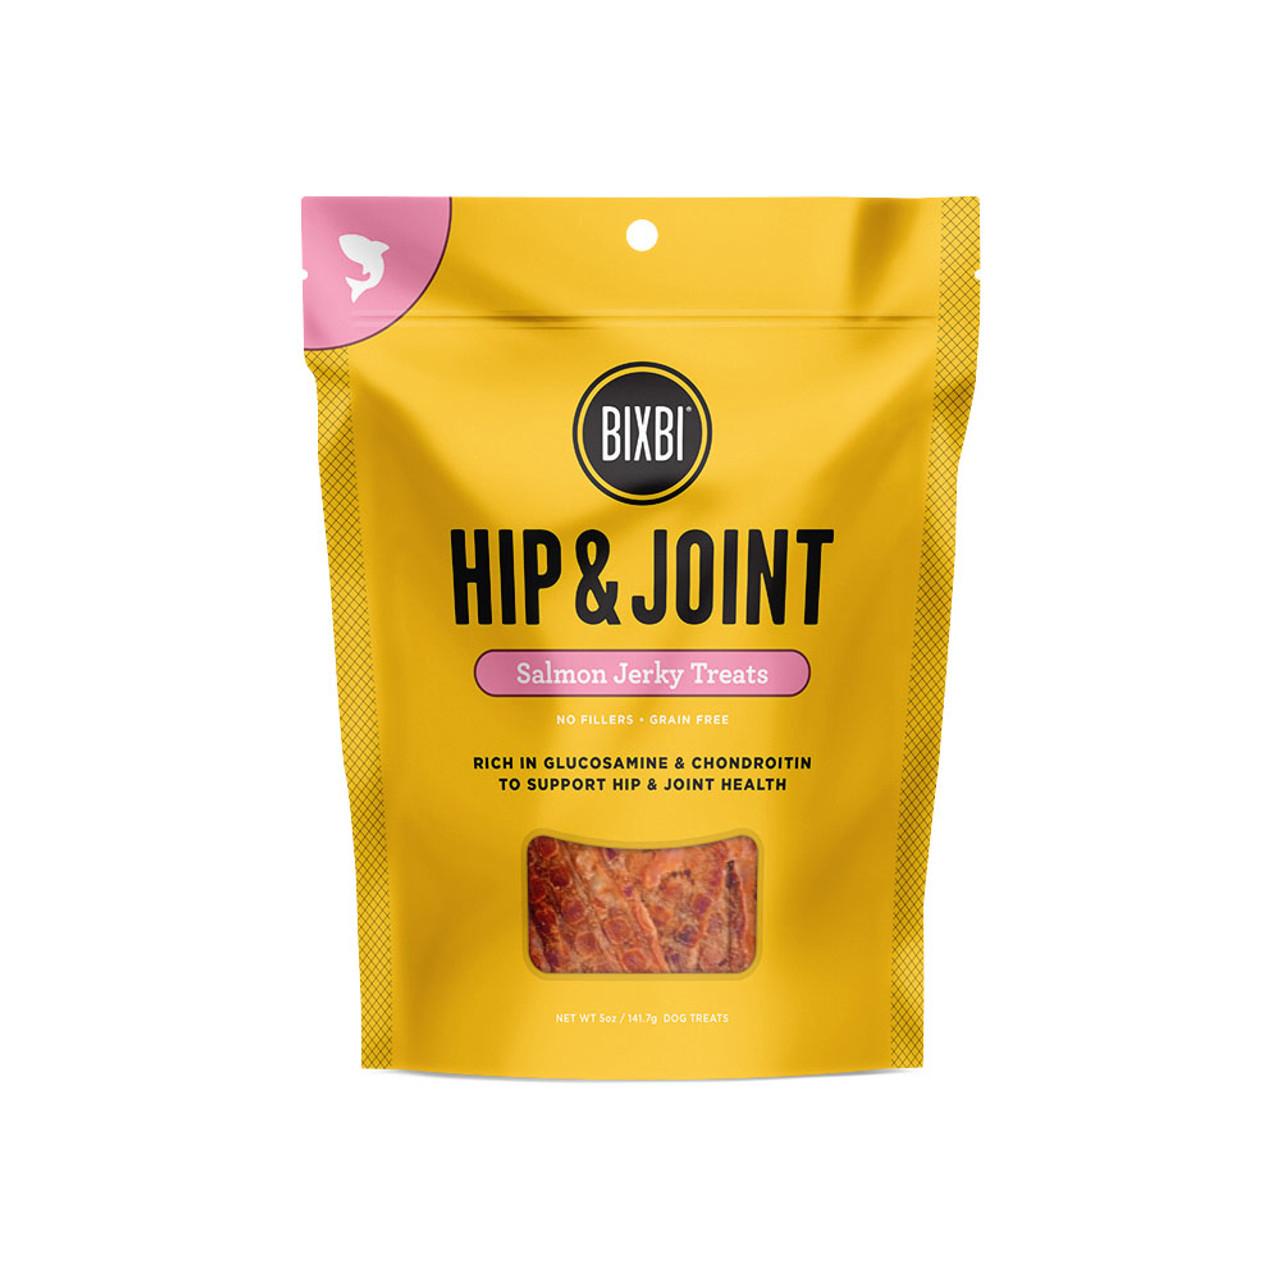 Bixbi Hip & Joint Salmon Jerky Dog Treats